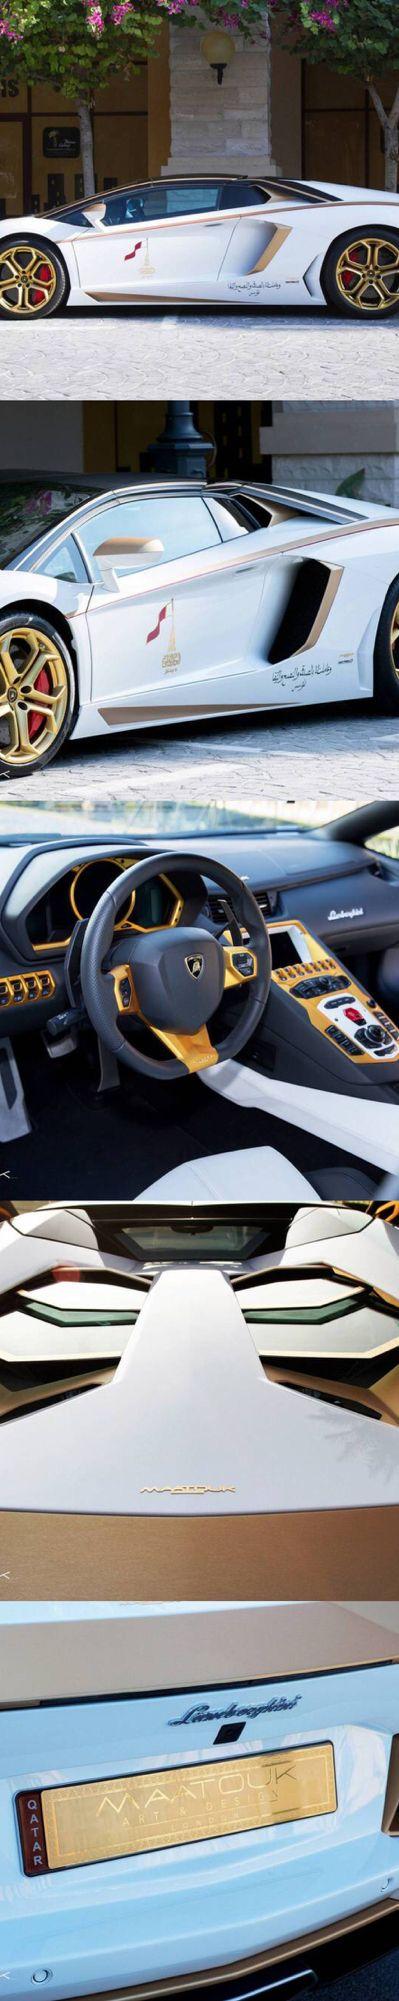 Lamborghini. A good looking car deserves a high quality trunk organizer http://www.amazon.com/dp/B00EARP1JO  #RePin by AT Social Media Marketing - Pinterest Marketing Specialists ATSocialMedia.co.uk